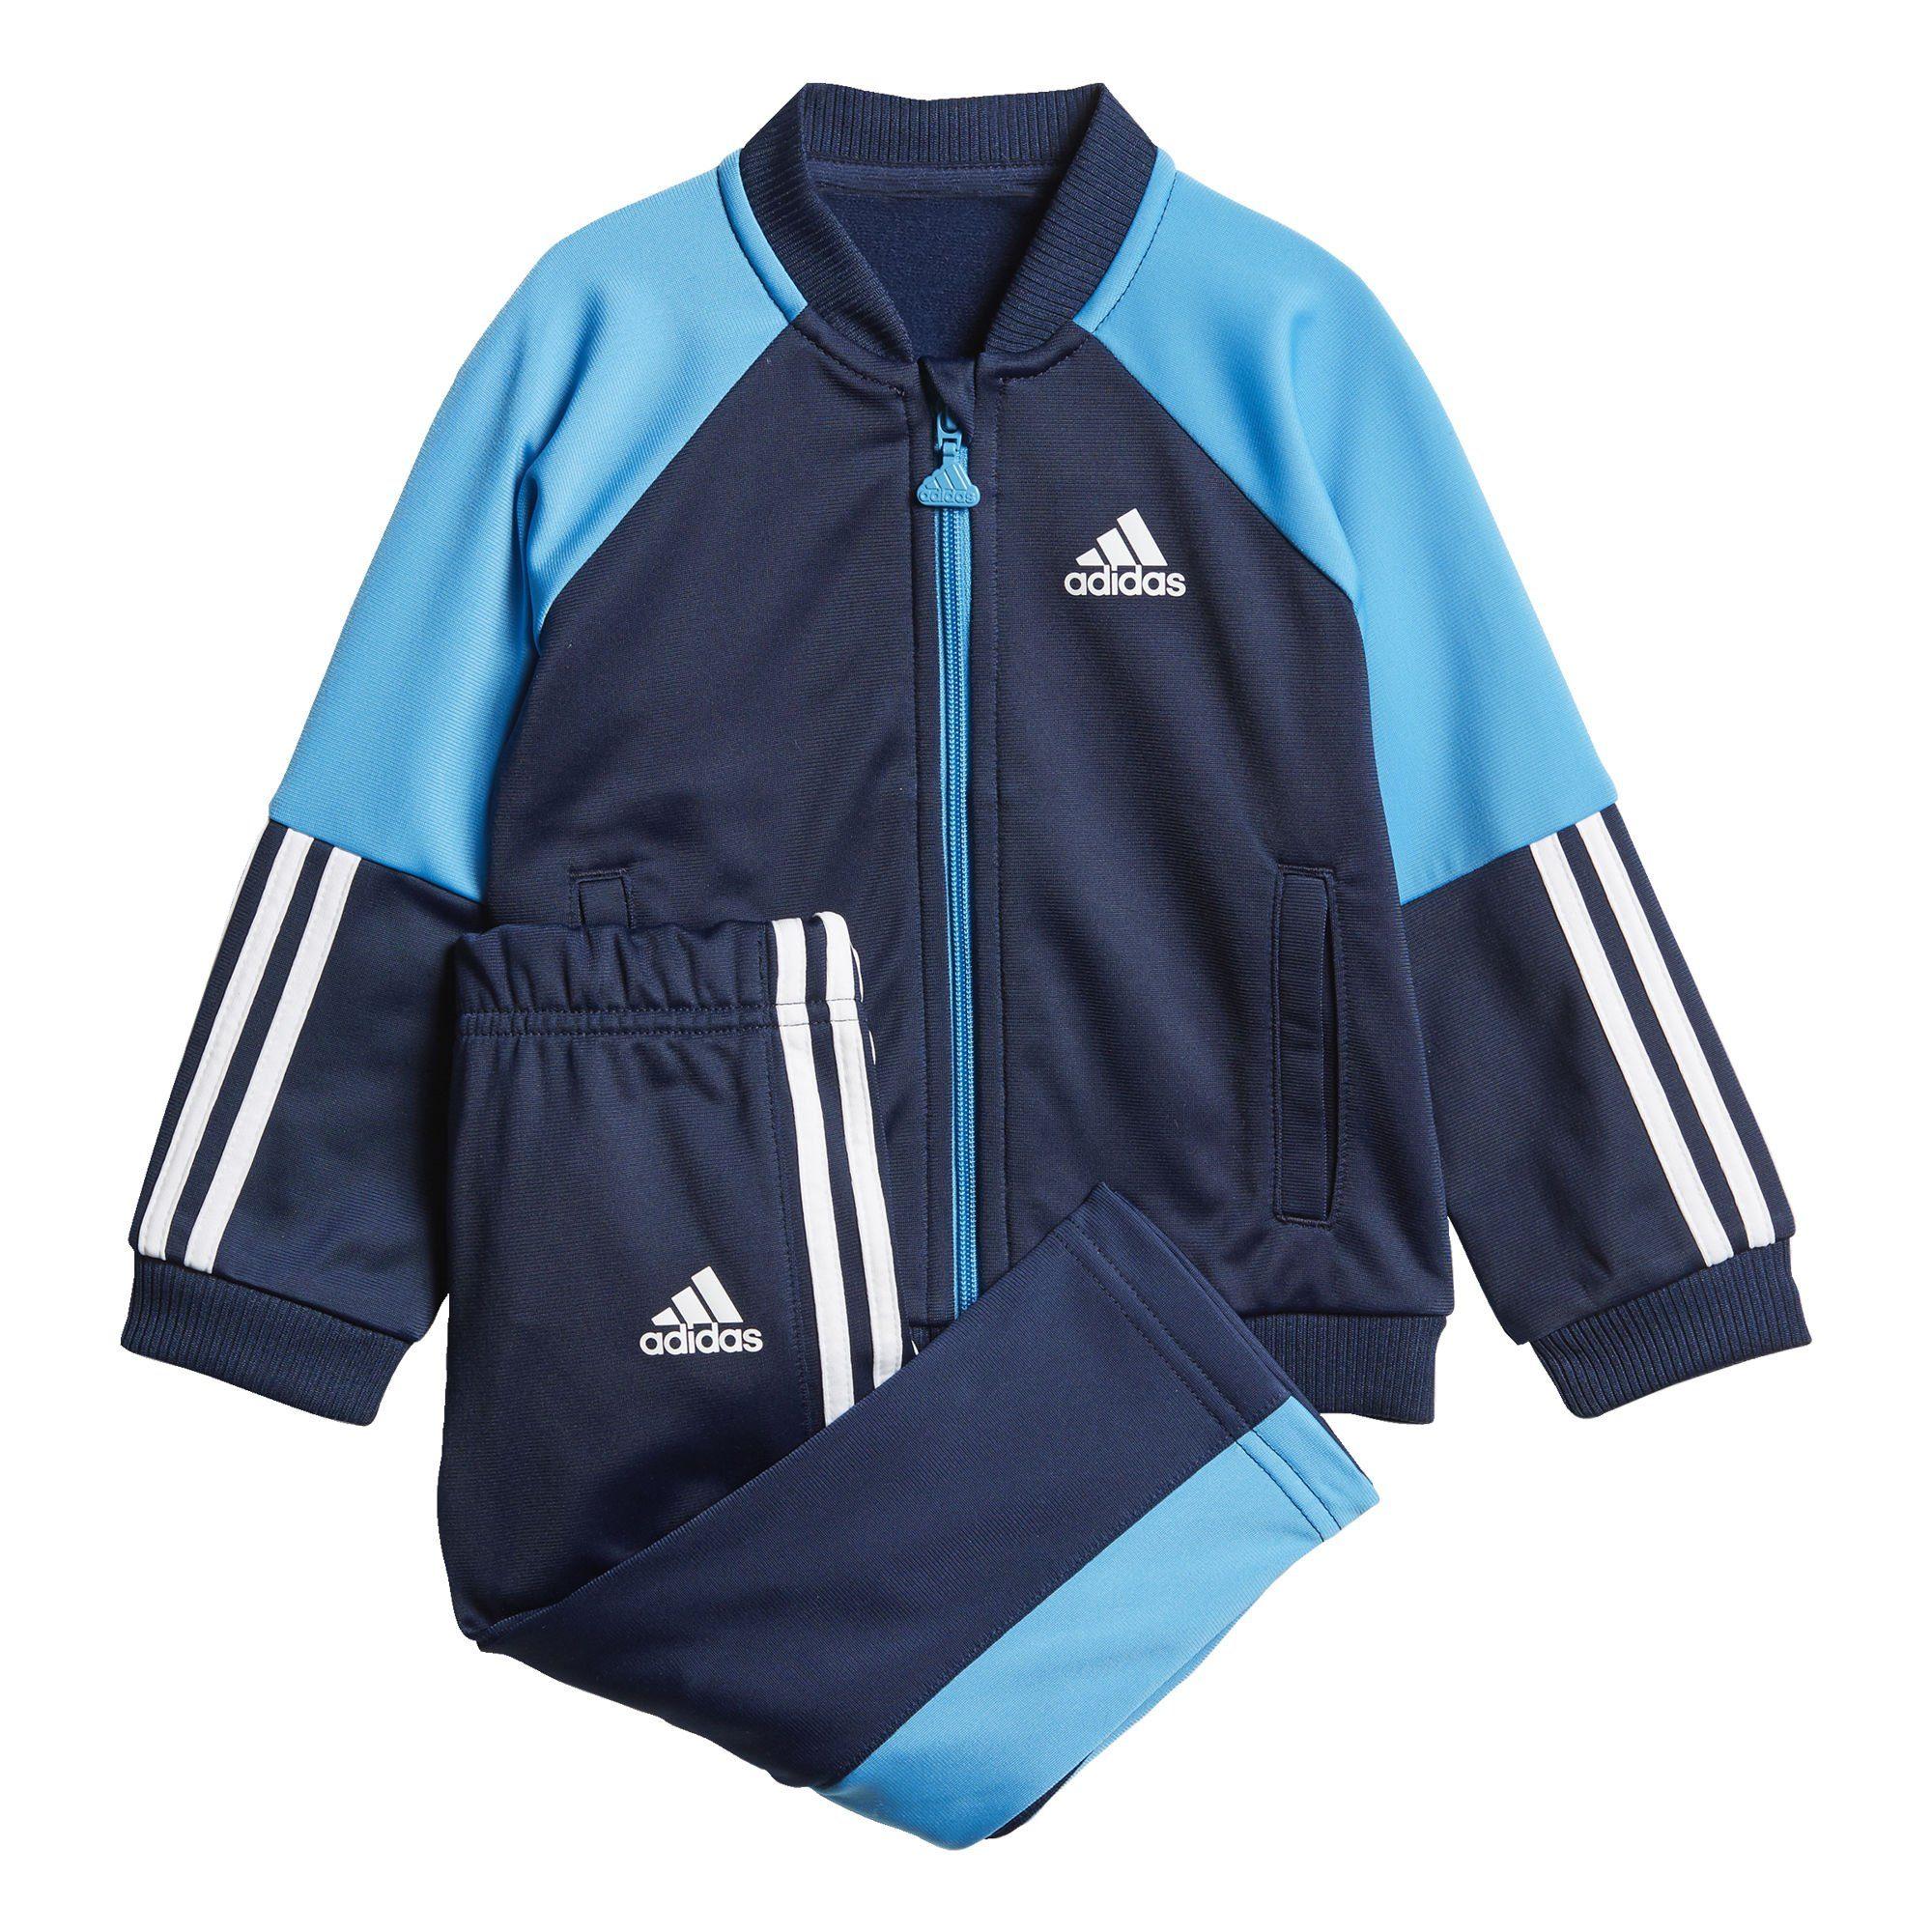 adidas Performance Trainingsanzug »Shiny Trainingsanzug«, Jacke und Hose: Regulär geschnitten online kaufen | OTTO